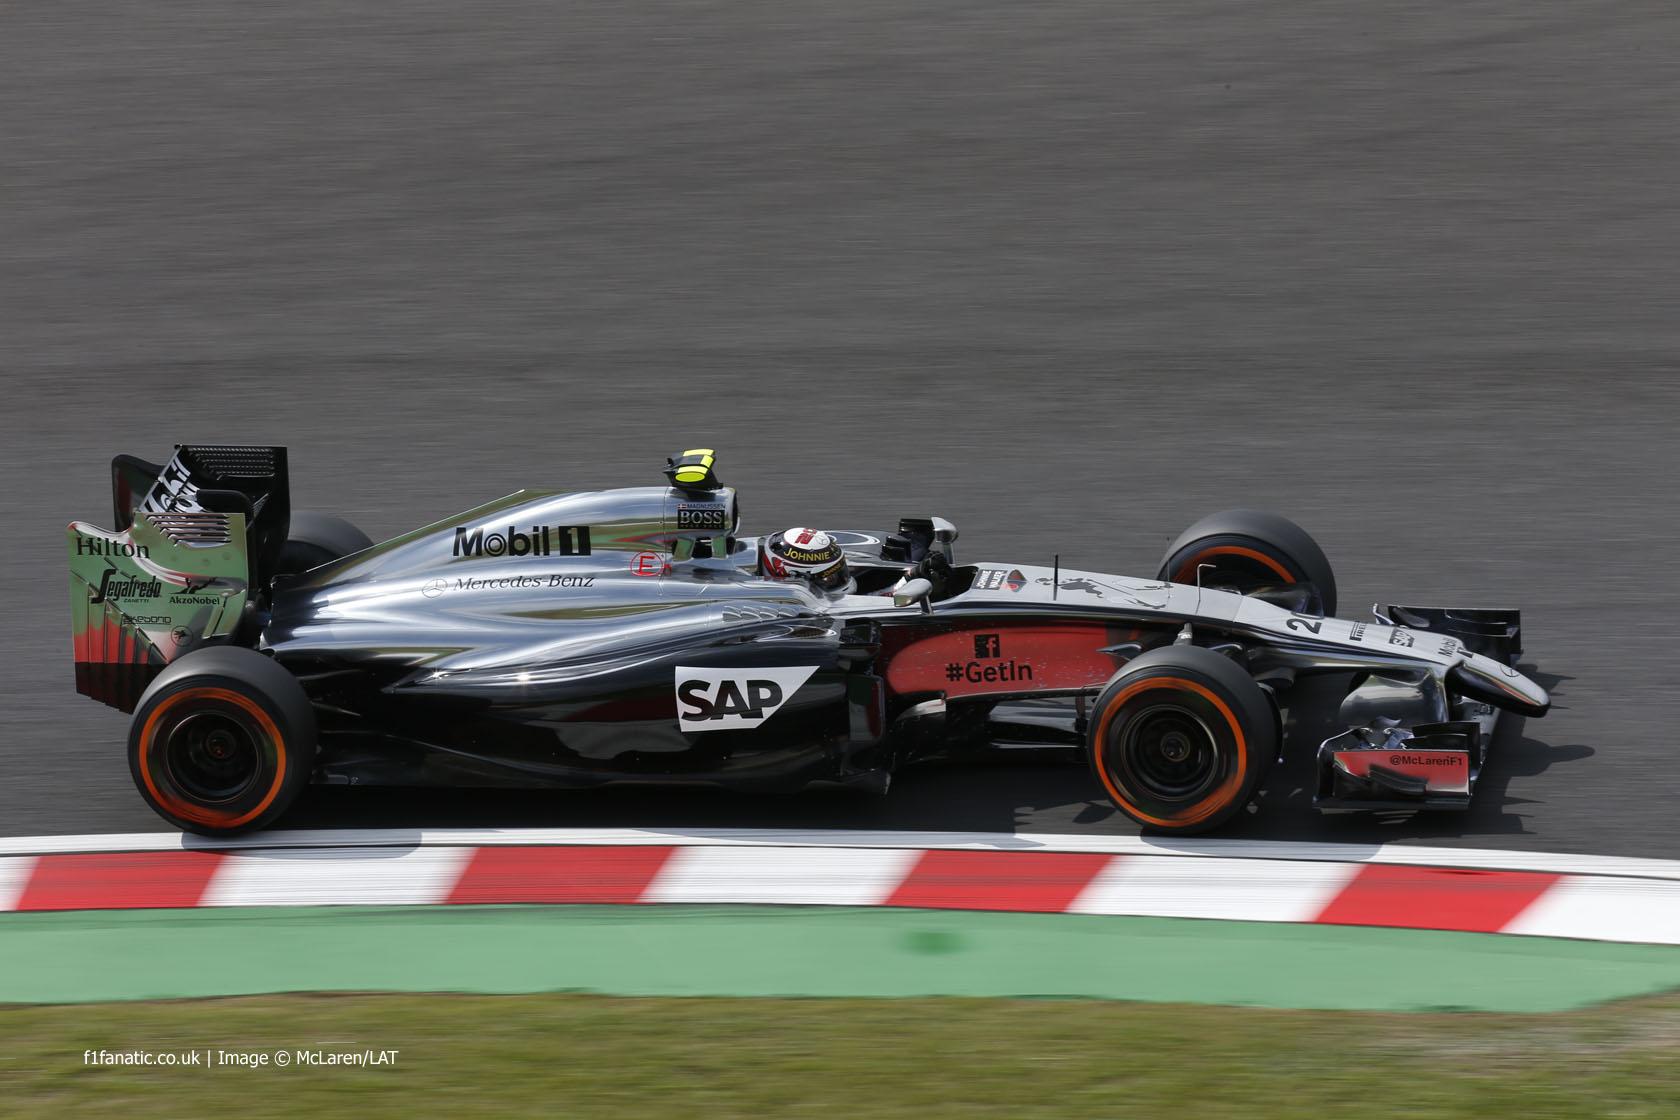 Kevin Magnussen, McLaren, Suzuka, 2014